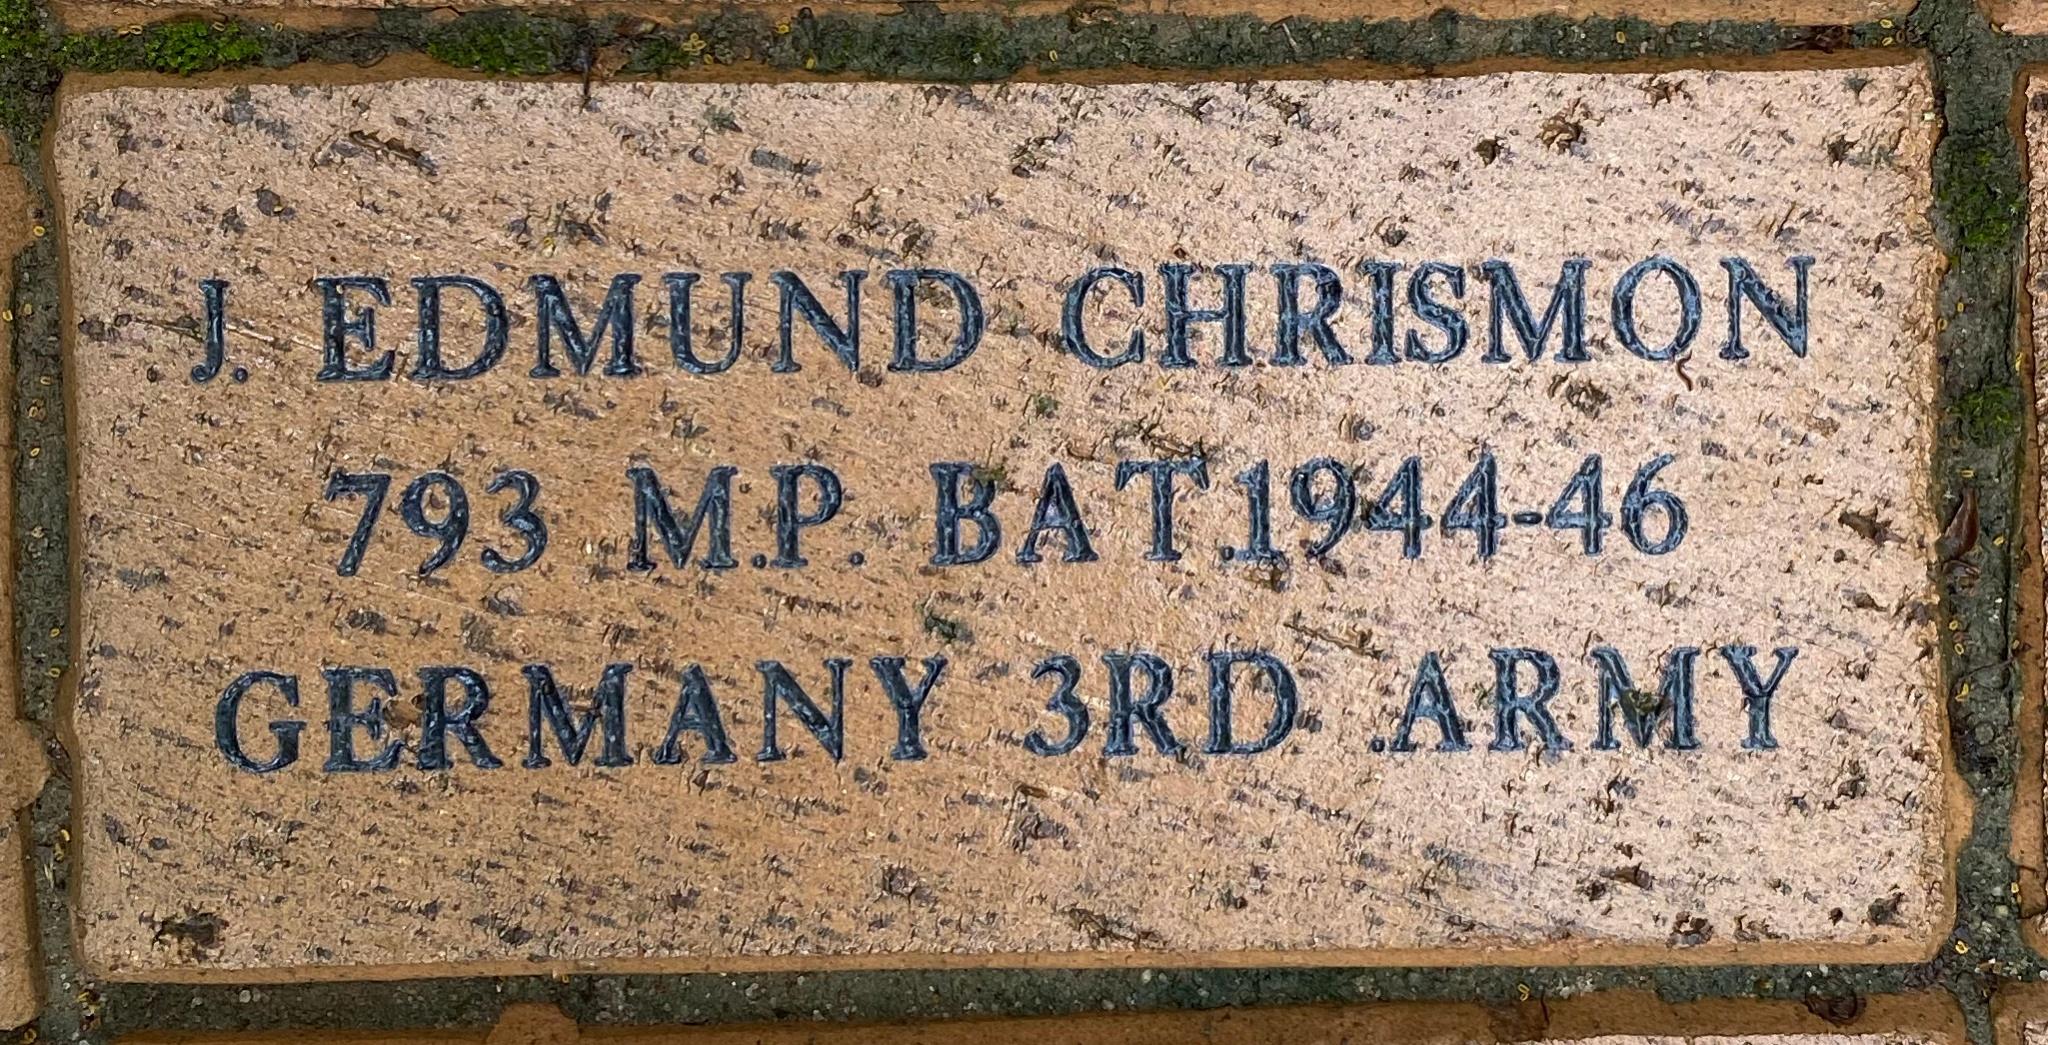 J. EDMUND CHRISMON 793 M.P. BAT 1944-46 GERMANY 3RD ARMY